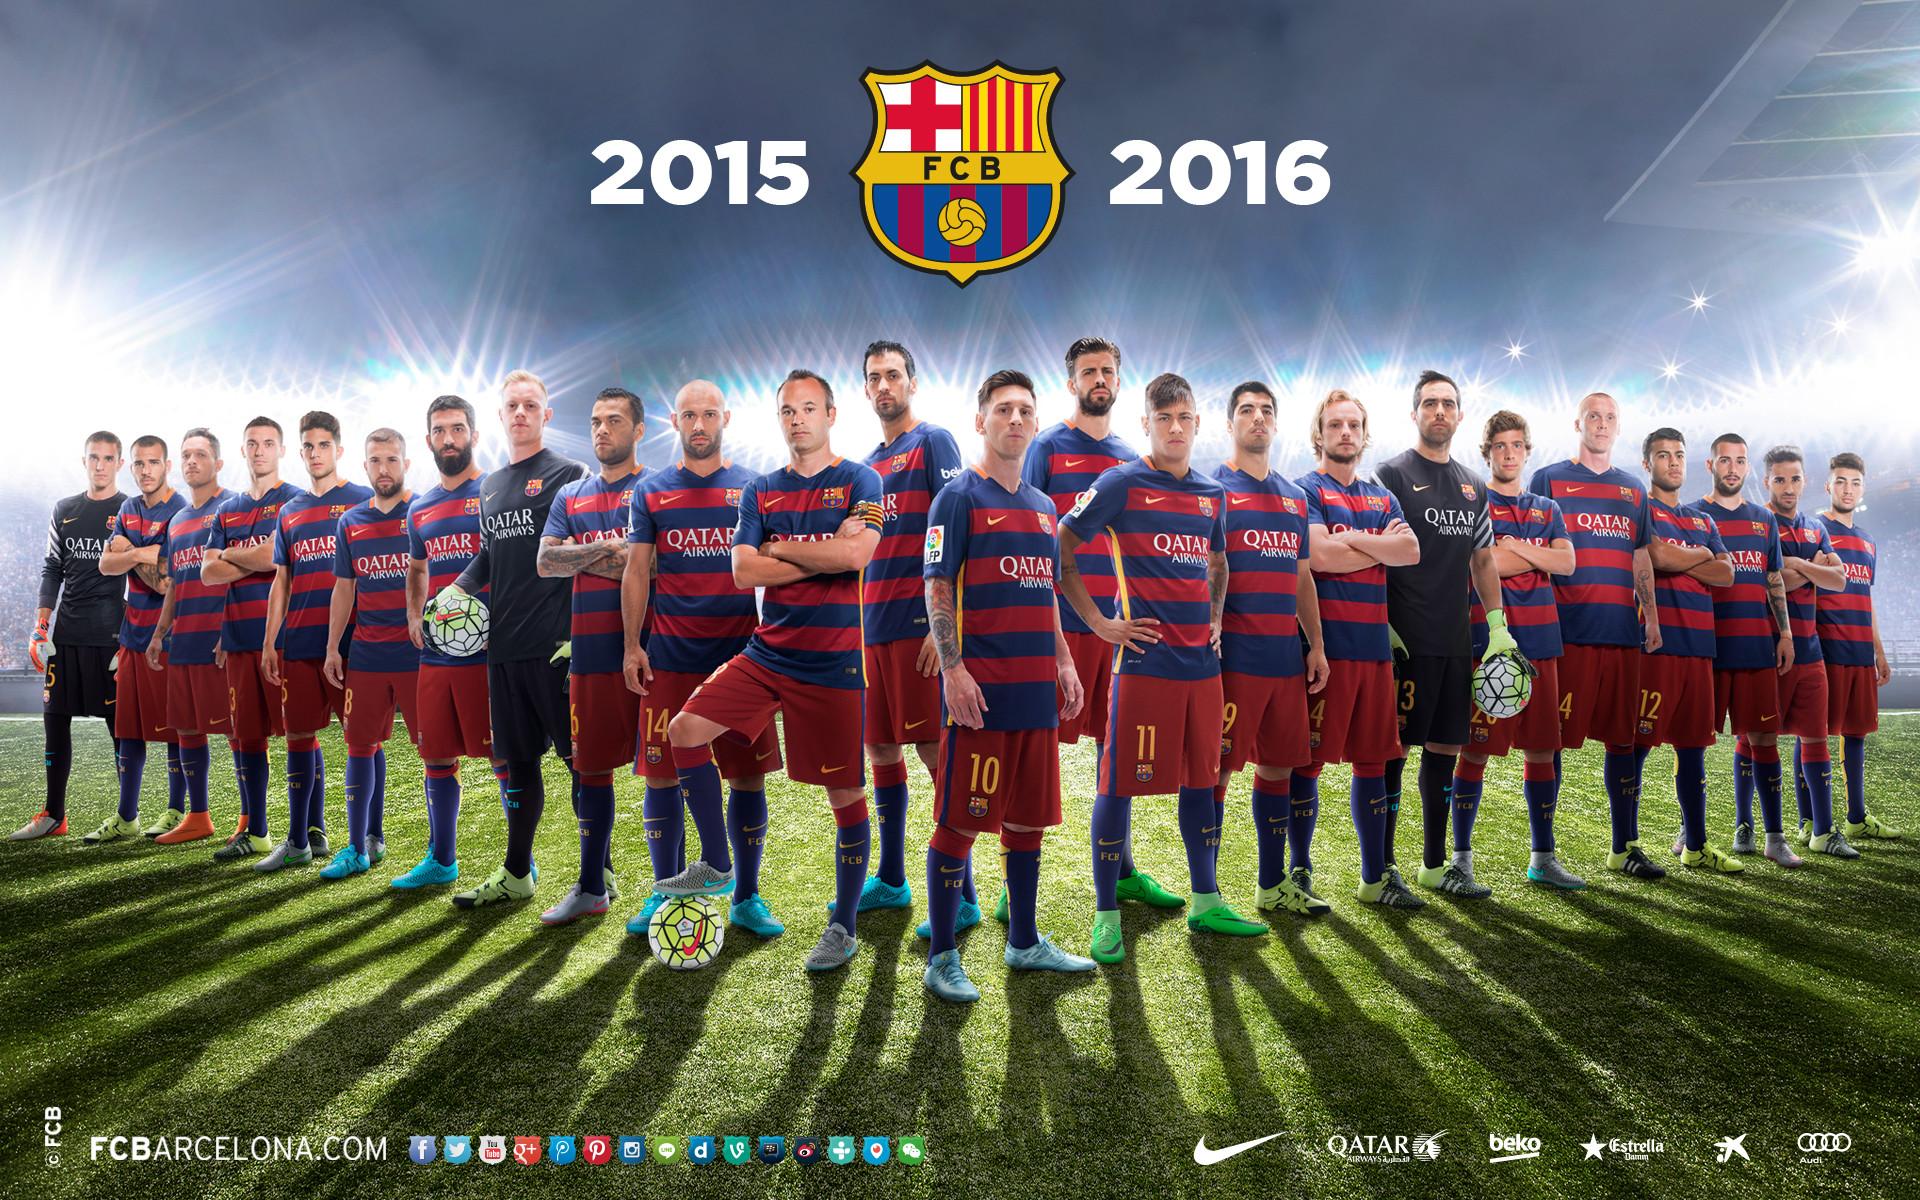 Free FC Barcelona Backgrounds.